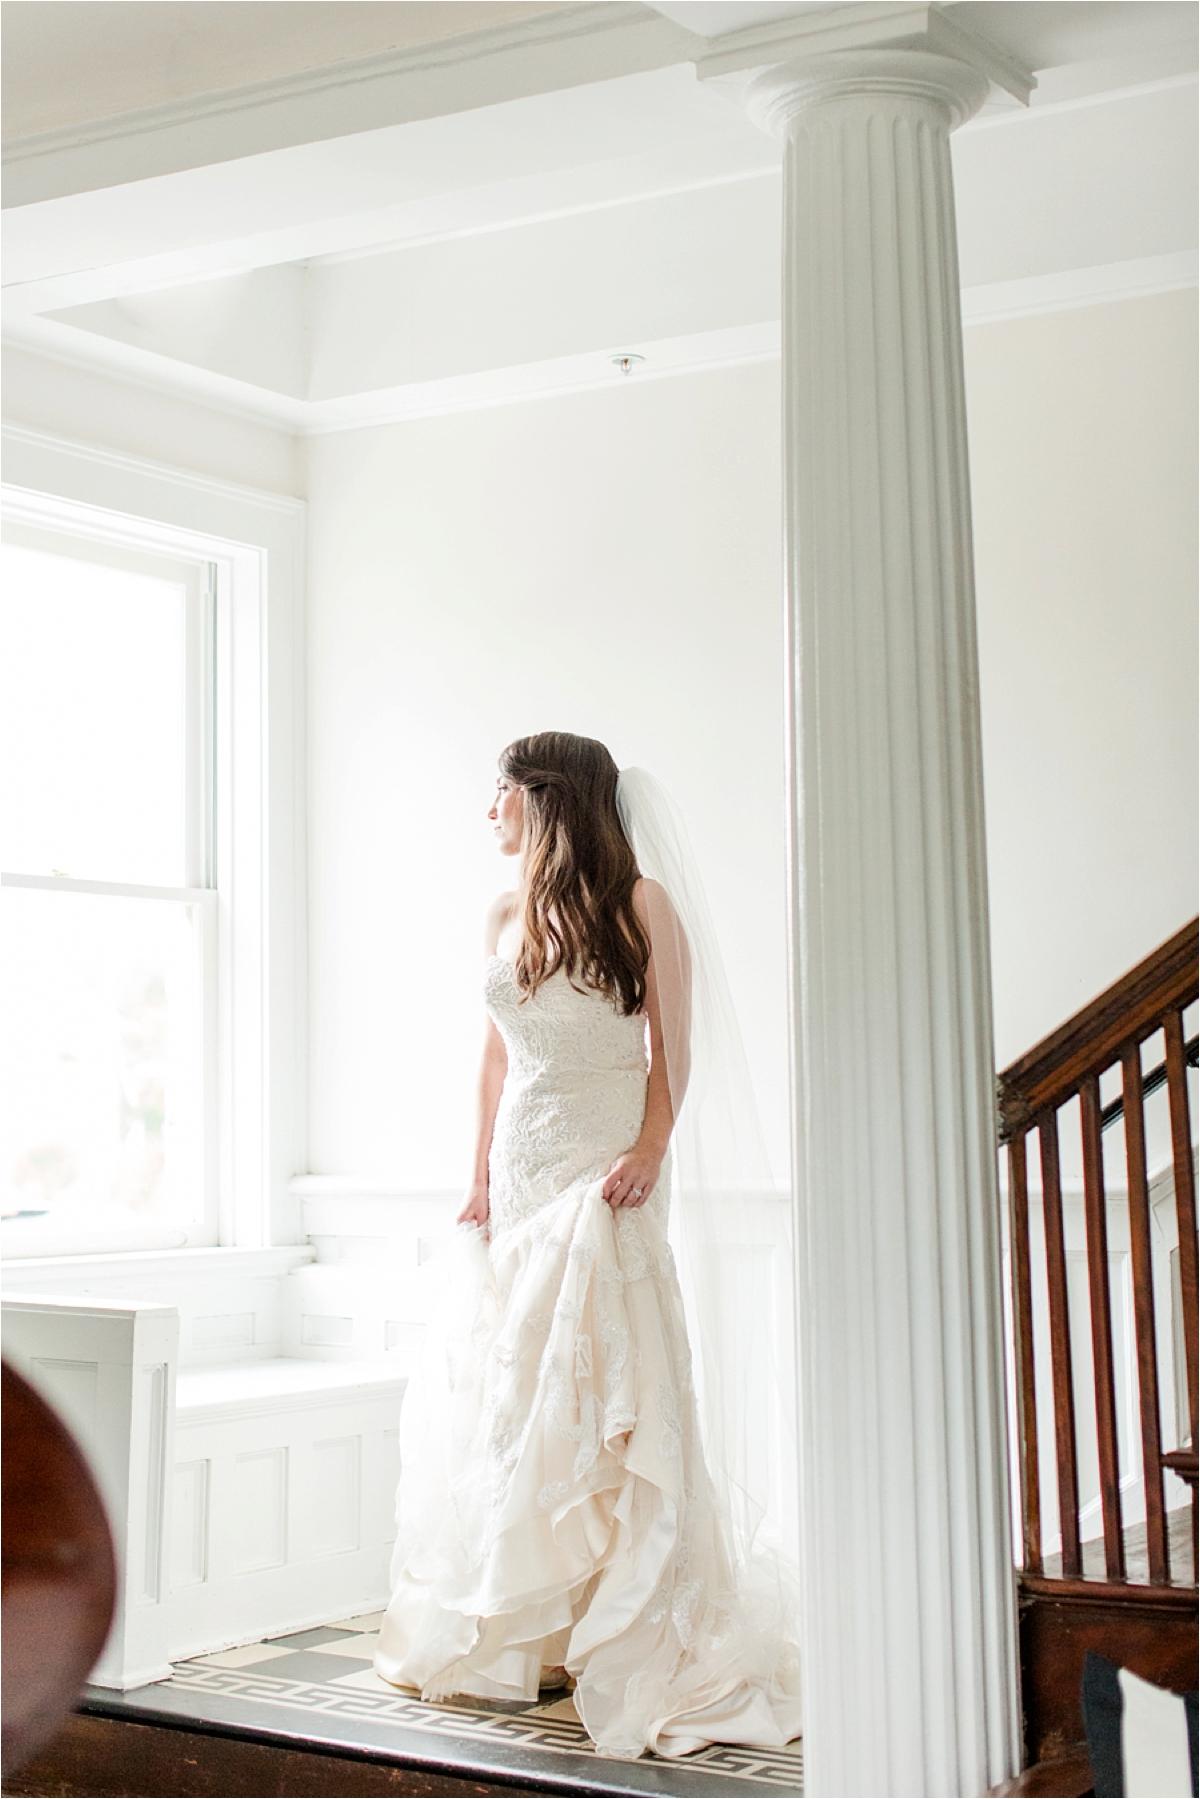 Bridal-Portraits-the Pillars-Mobile, Alabama-Dragonfly-Photography